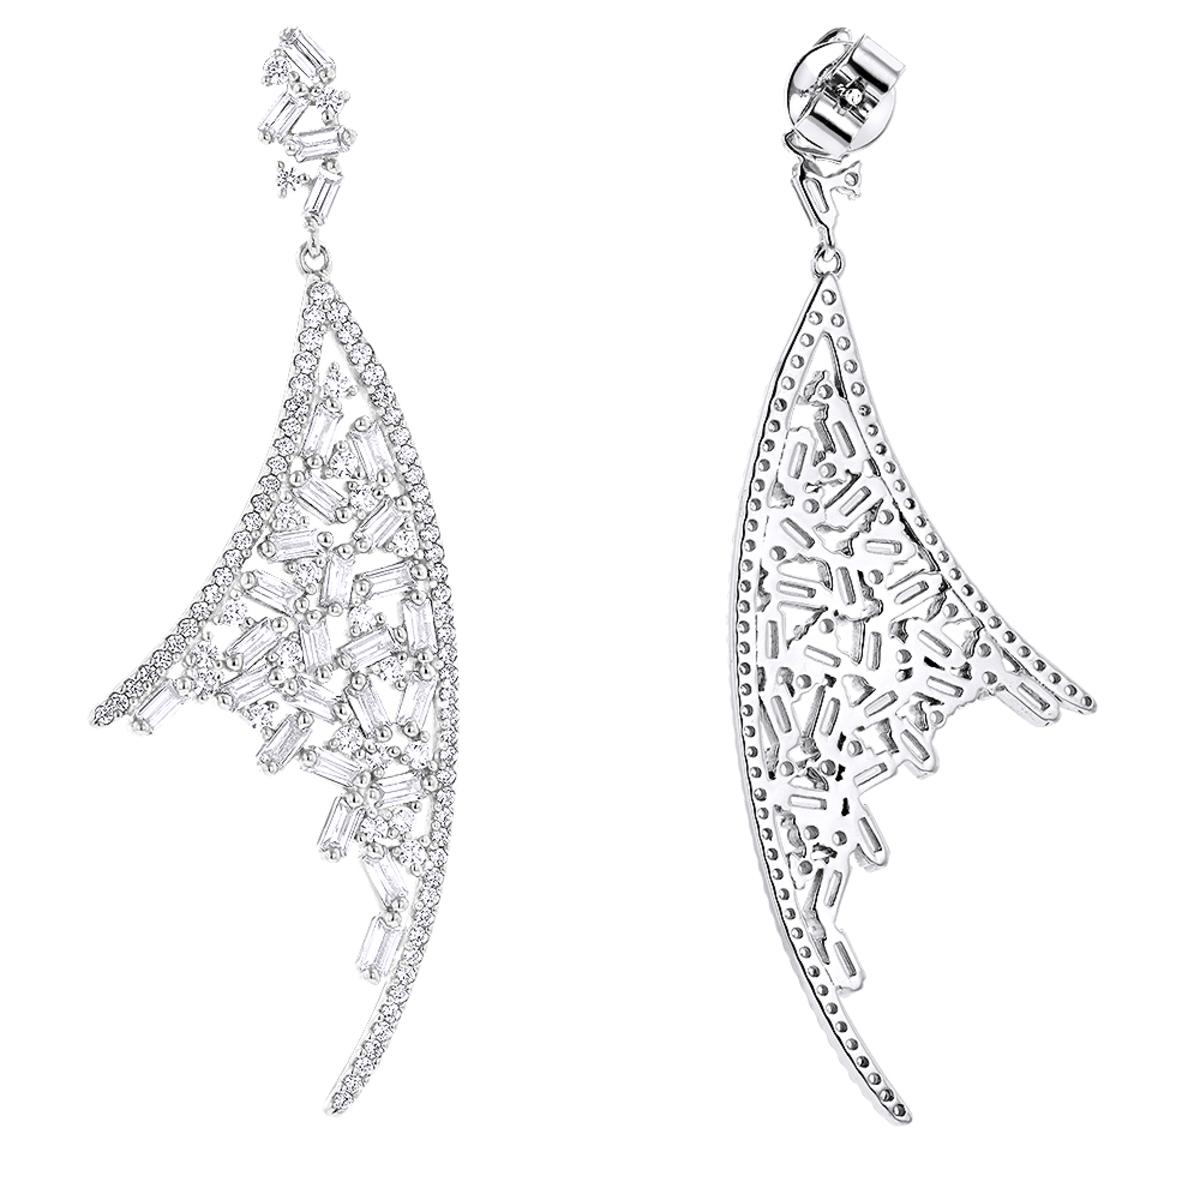 Unique 14K Gold Designer Diamond Earrings 3.3ct